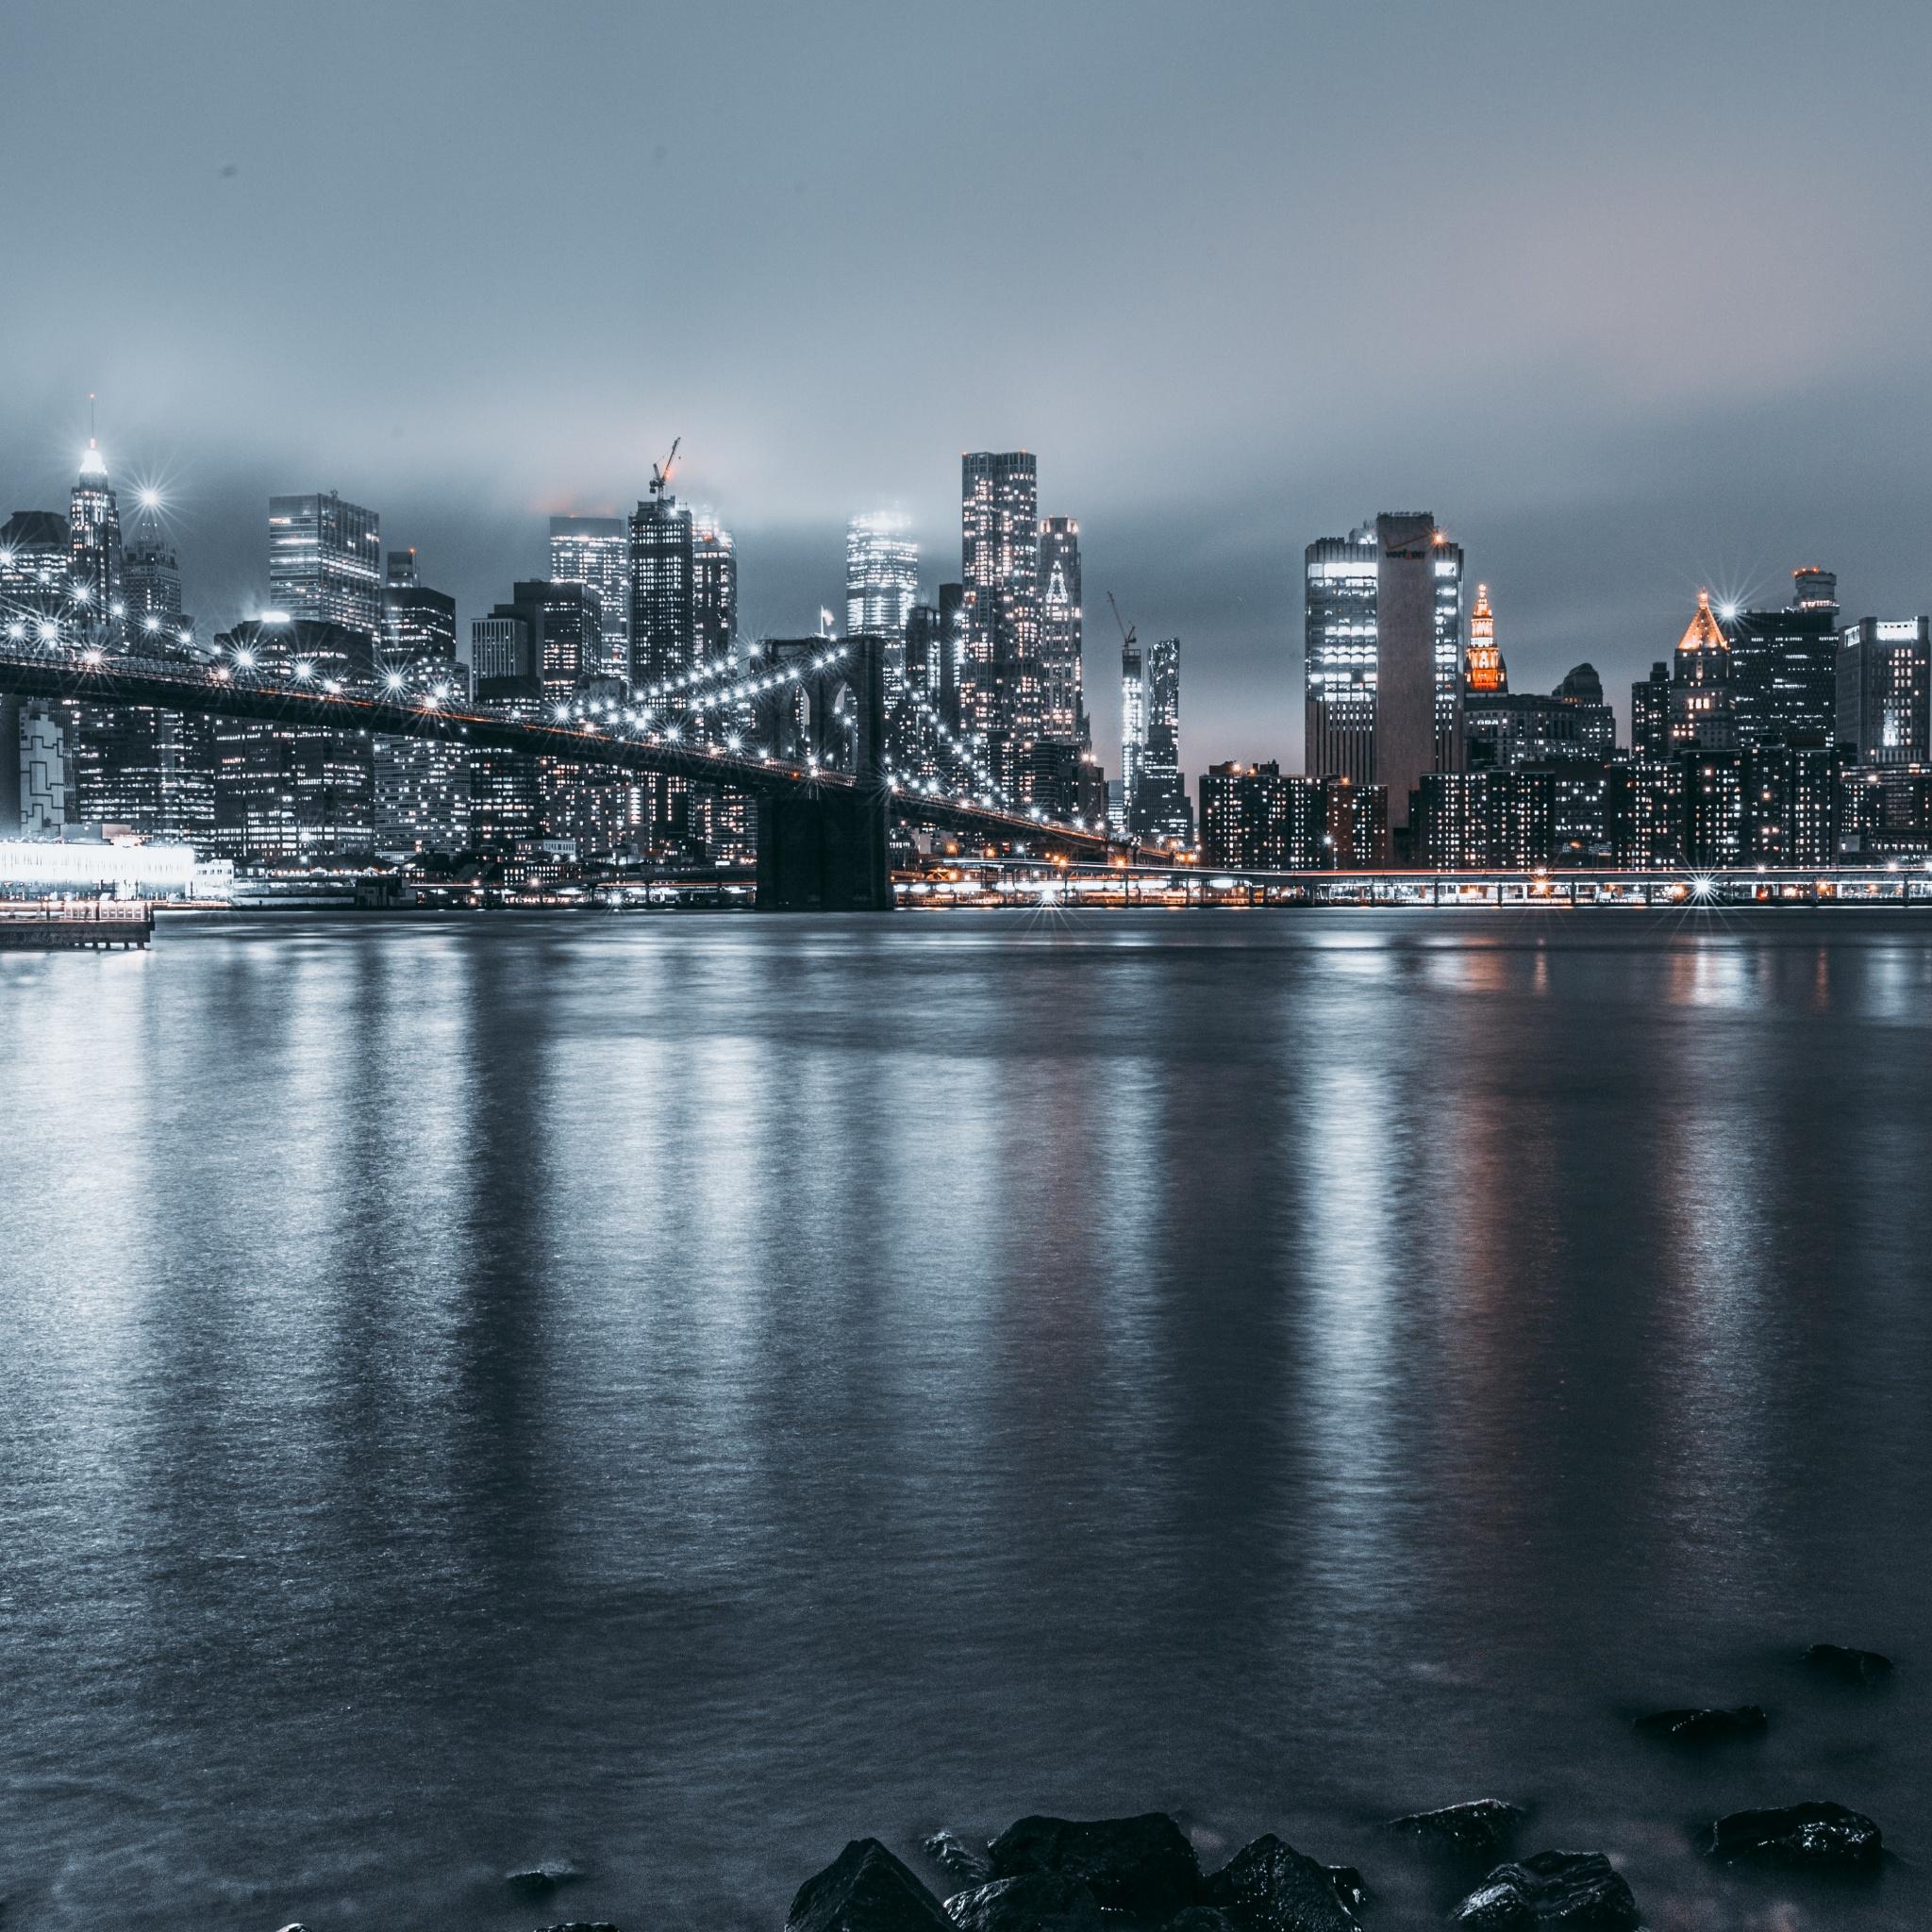 Brooklyn 4K Wallpaper, Cityscape, Night, City Lights, New